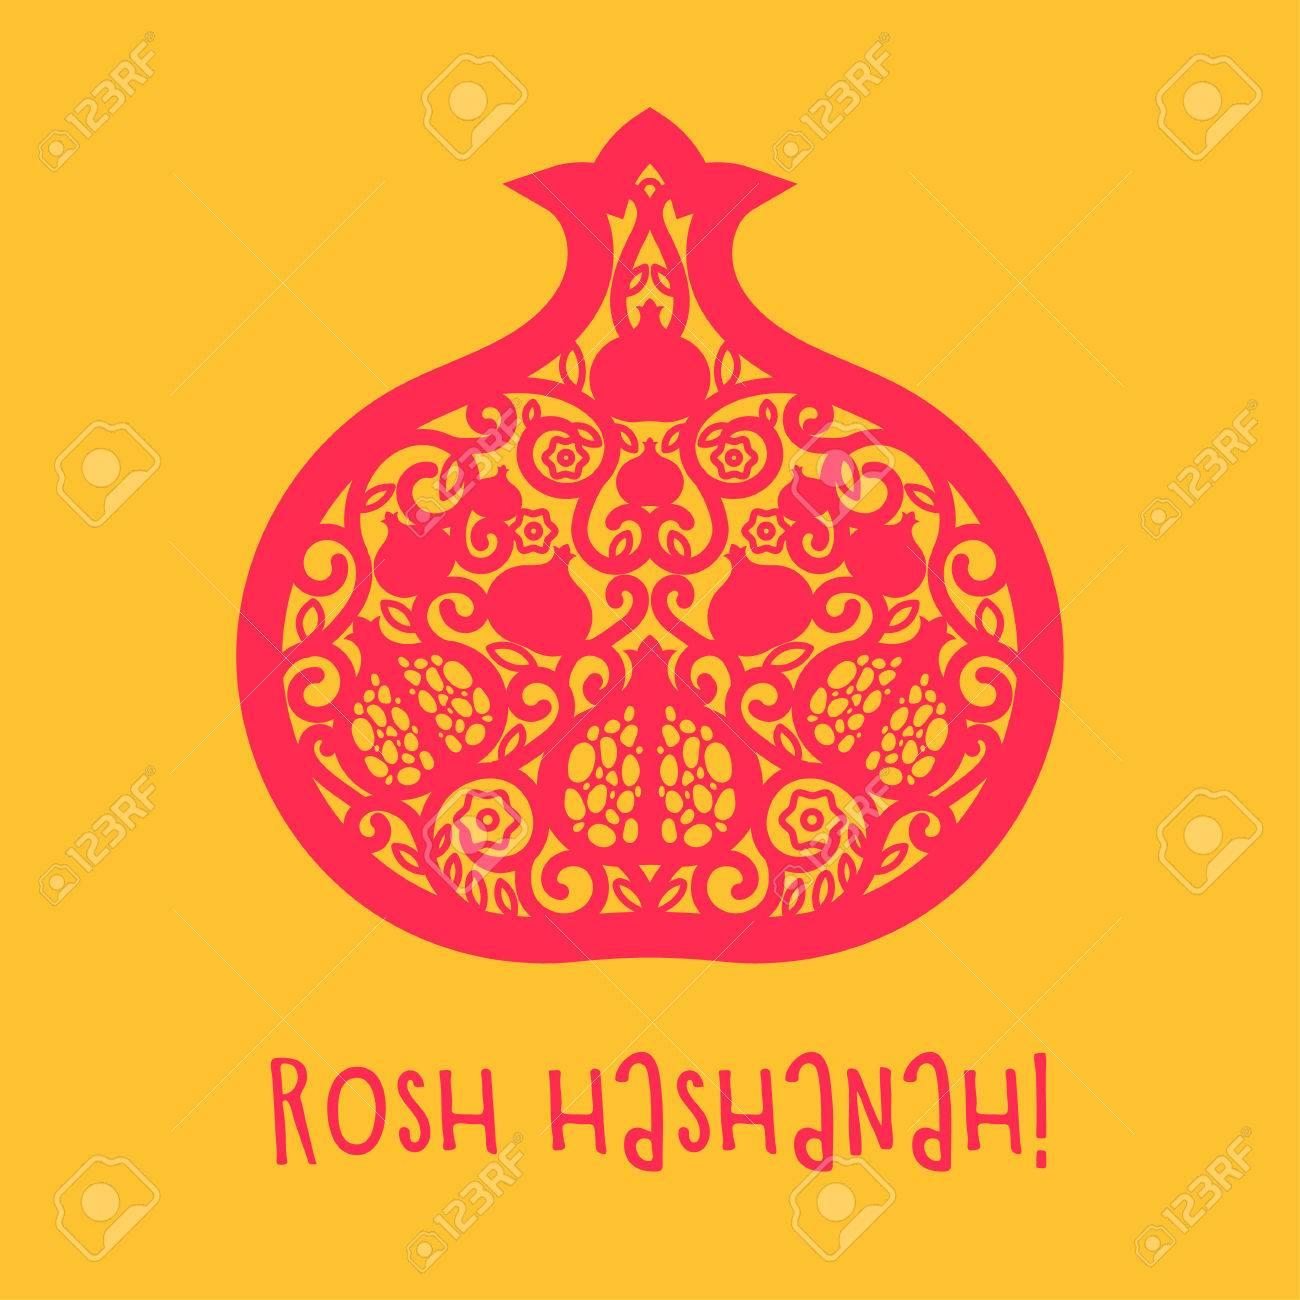 Rosh hashana jewish new year greeting card royalty free cliparts rosh hashana jewish new year greeting card stock vector 84947869 m4hsunfo